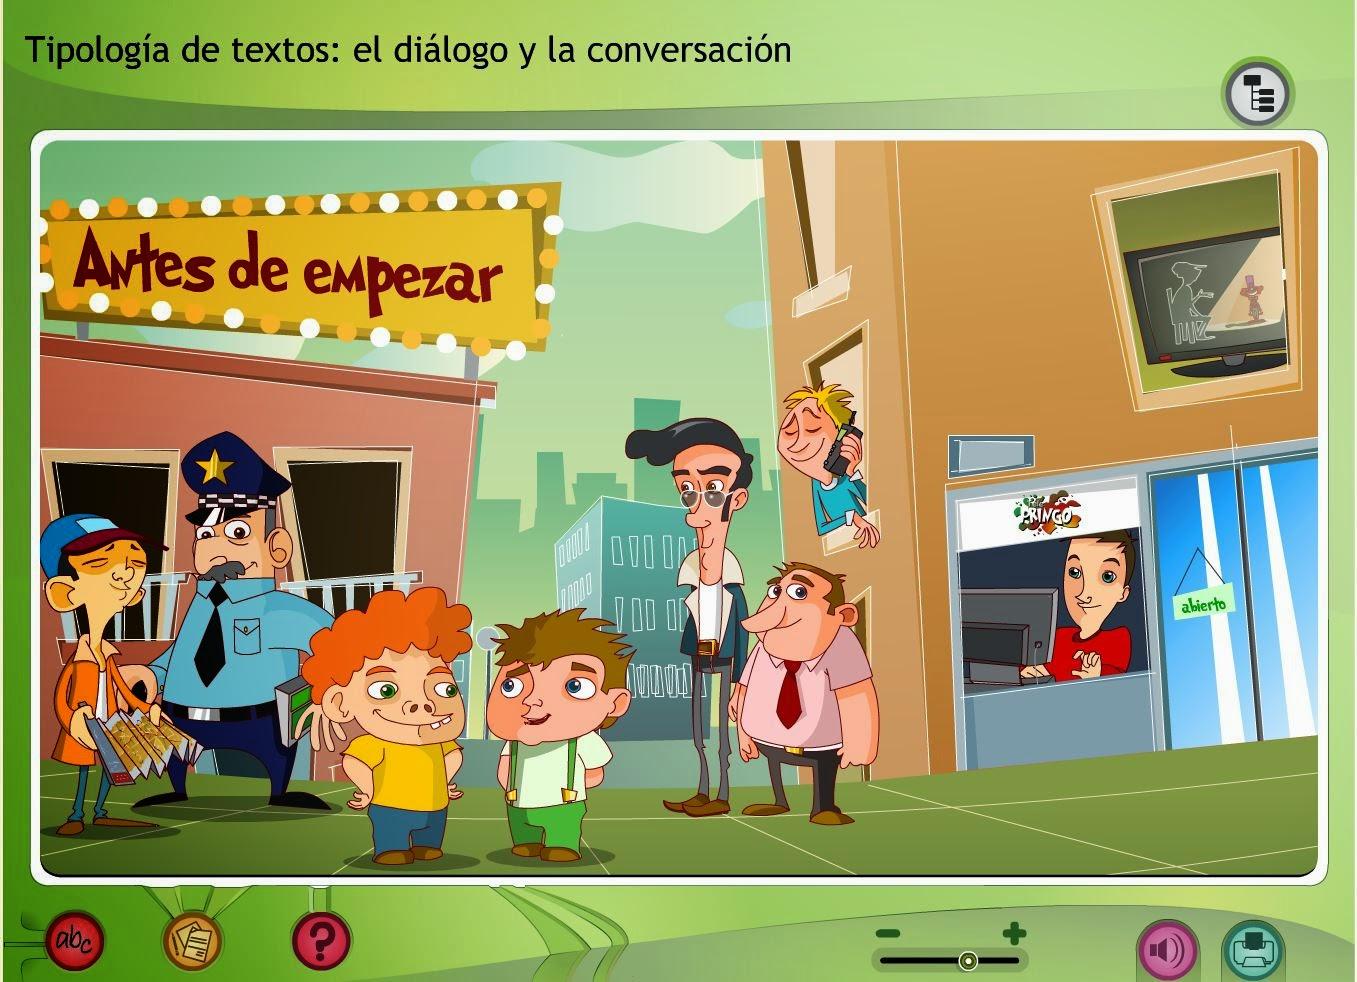 http://www.edu.xunta.es/espazoAbalar/sites/espazoAbalar/files/datos/1285224006/contido/index.html